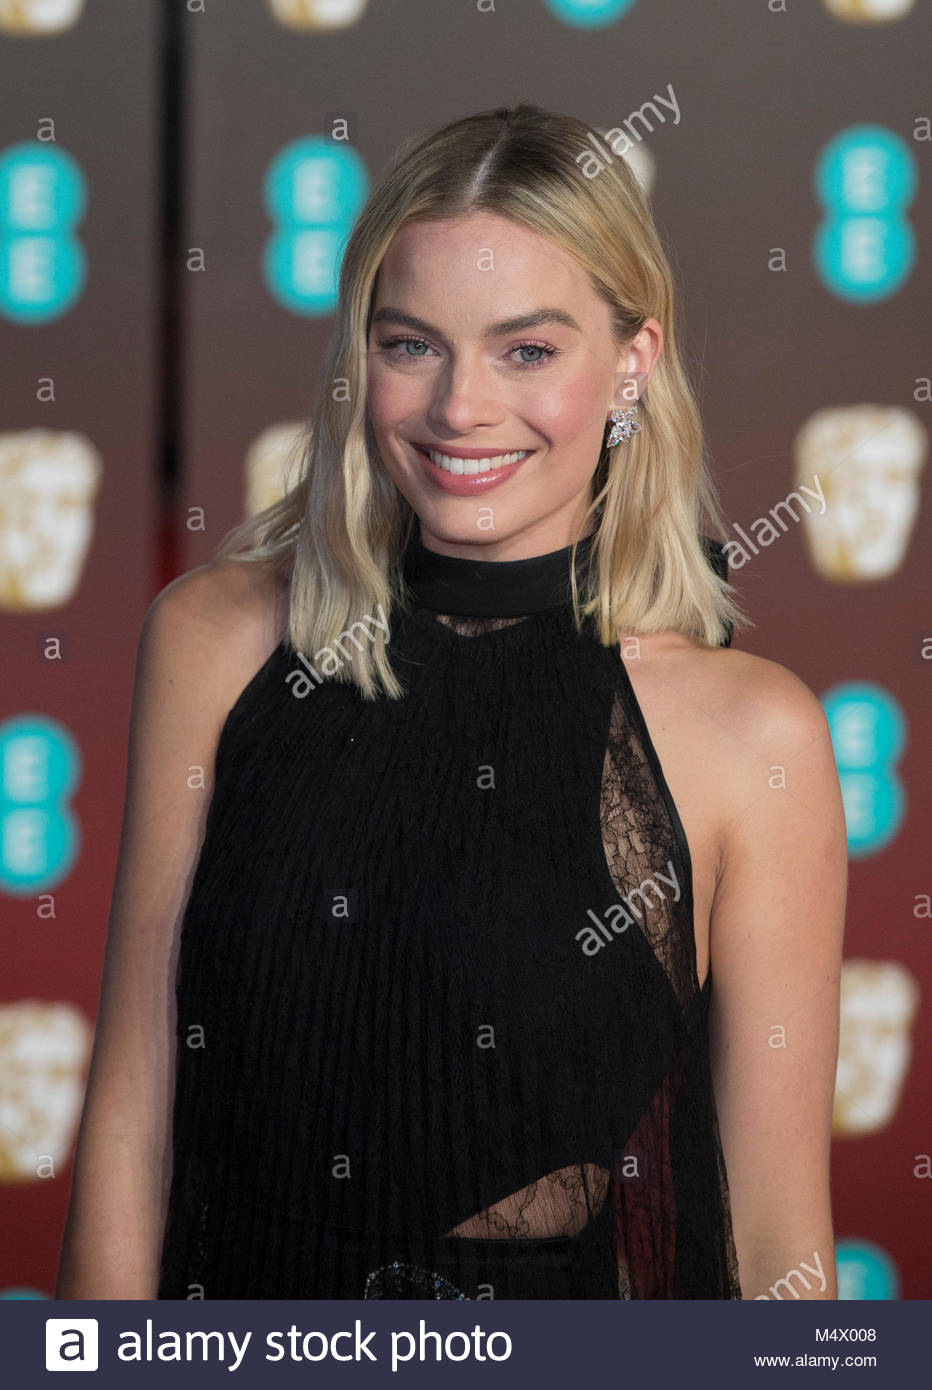 London, Großbritannien. 18. Feb 2018. Margot Robbie bei den BAFTA Awards sind in der Royal Albert Hall in LondonStockfoto